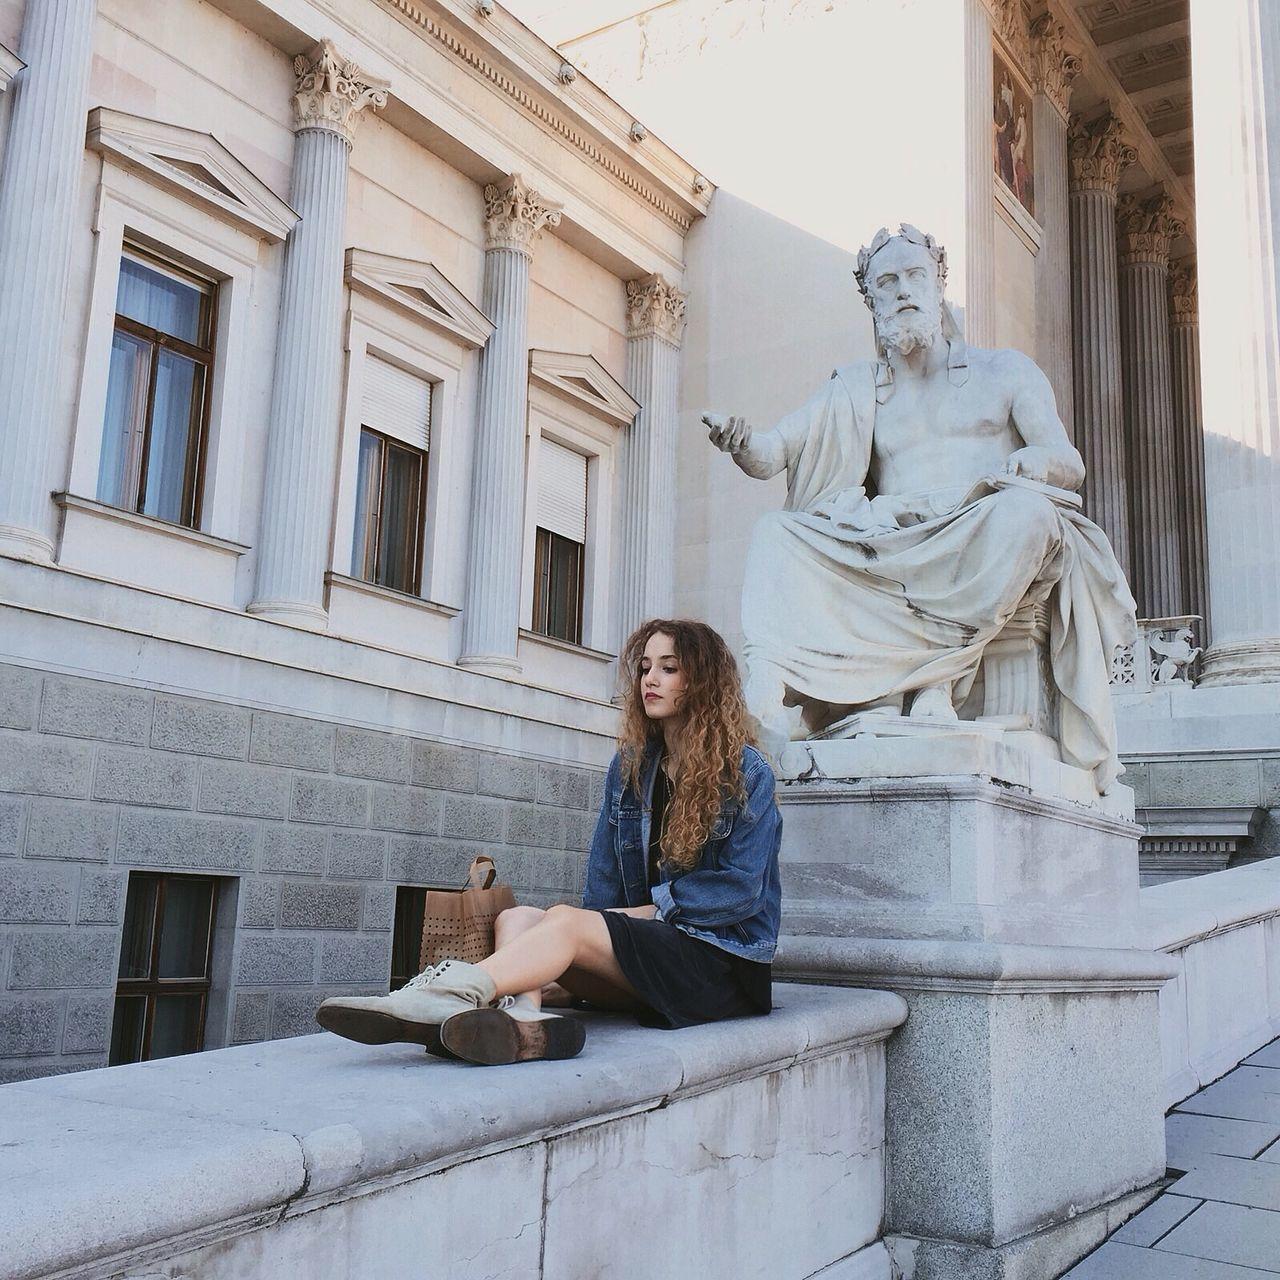 Beautiful stock photos of vienna, 20-24 Years, Architecture, Art, Art And Craft